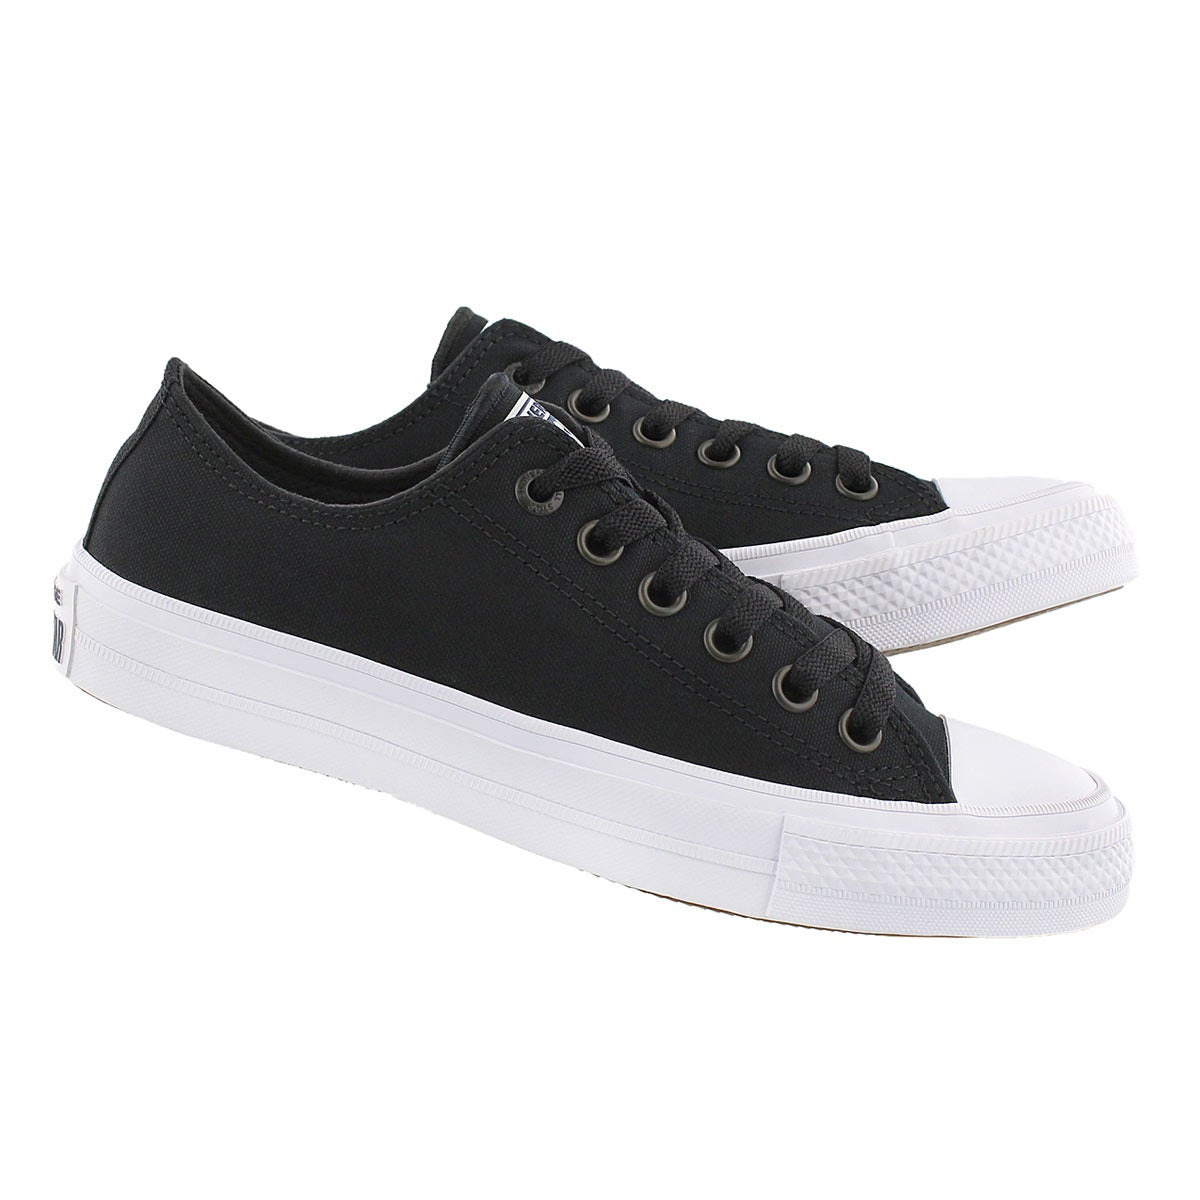 Lds Chuck II Viz Flow black sneaker